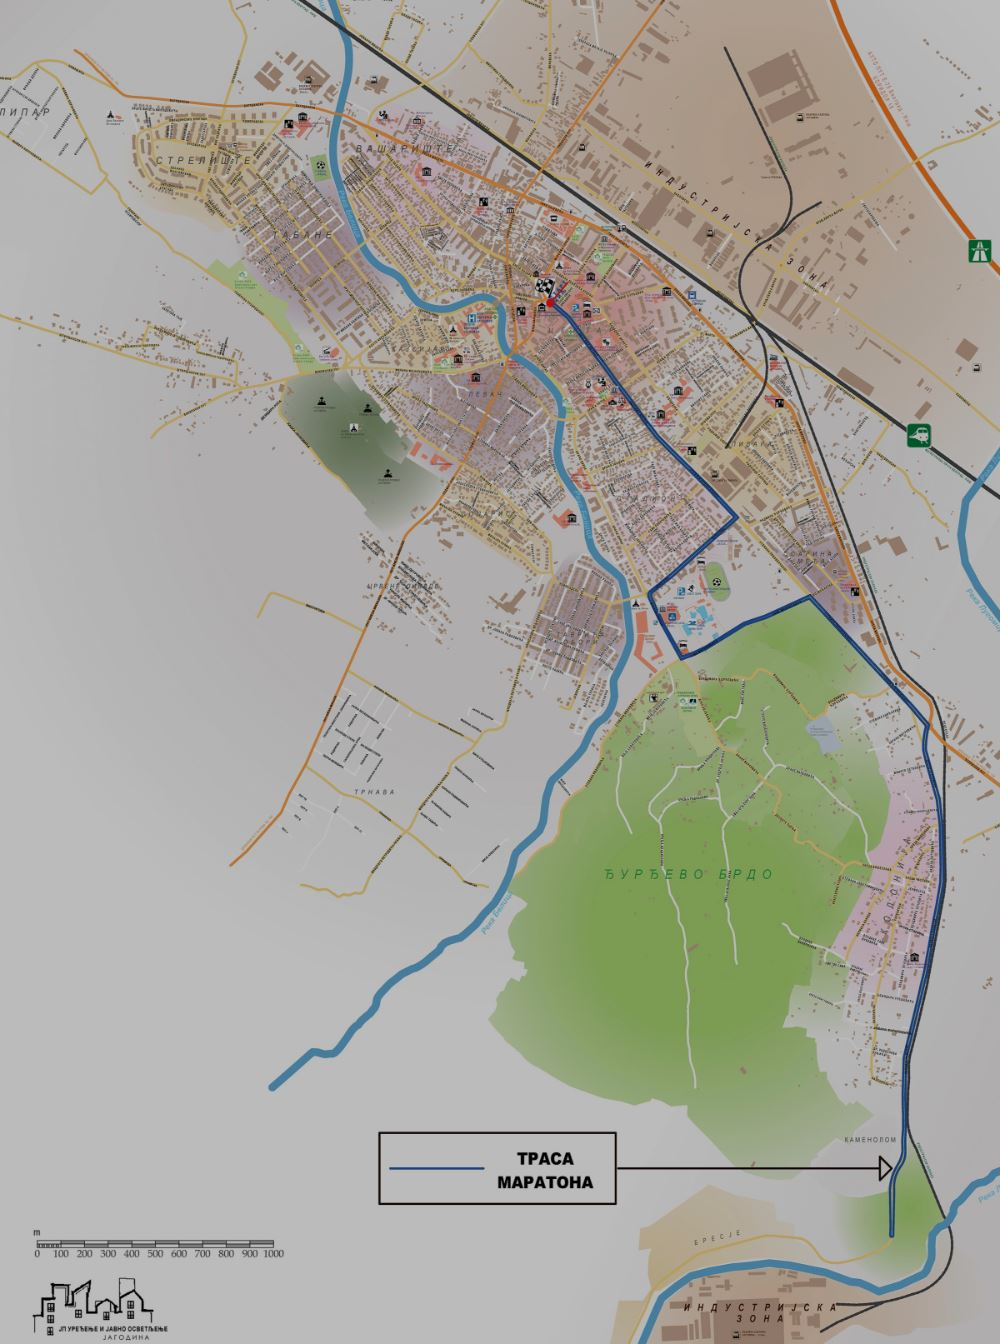 Jagodinski Marathon Mappa del percorso